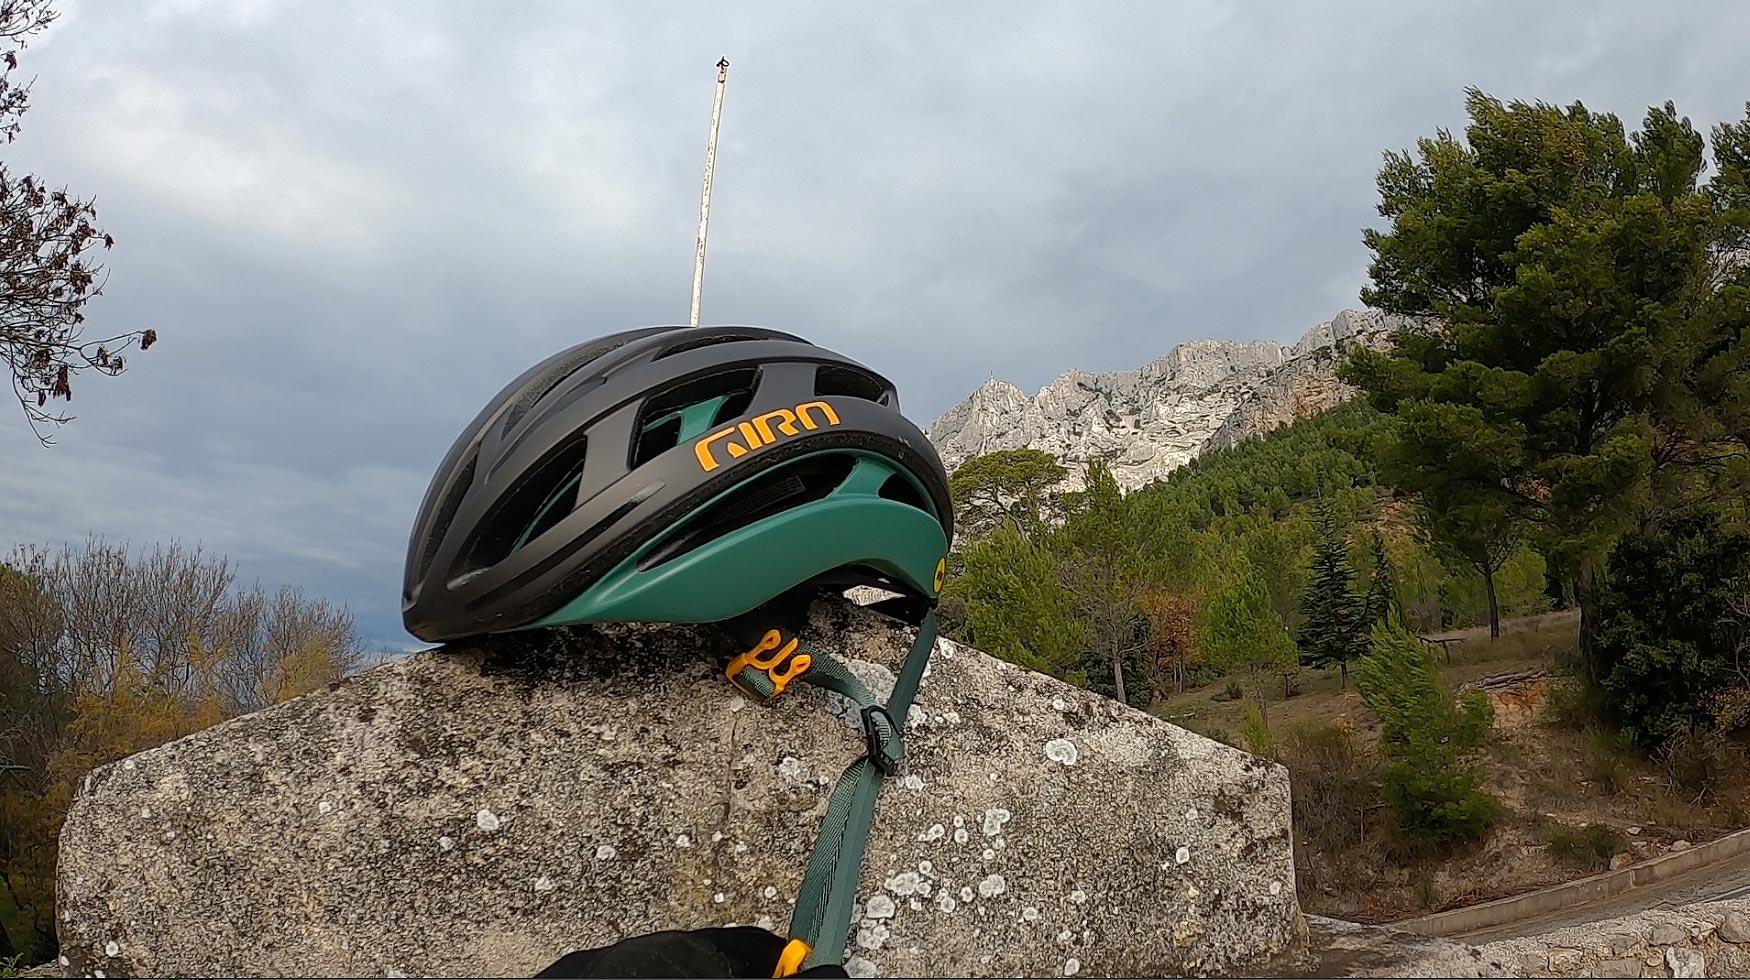 Test du casque Giro Helios